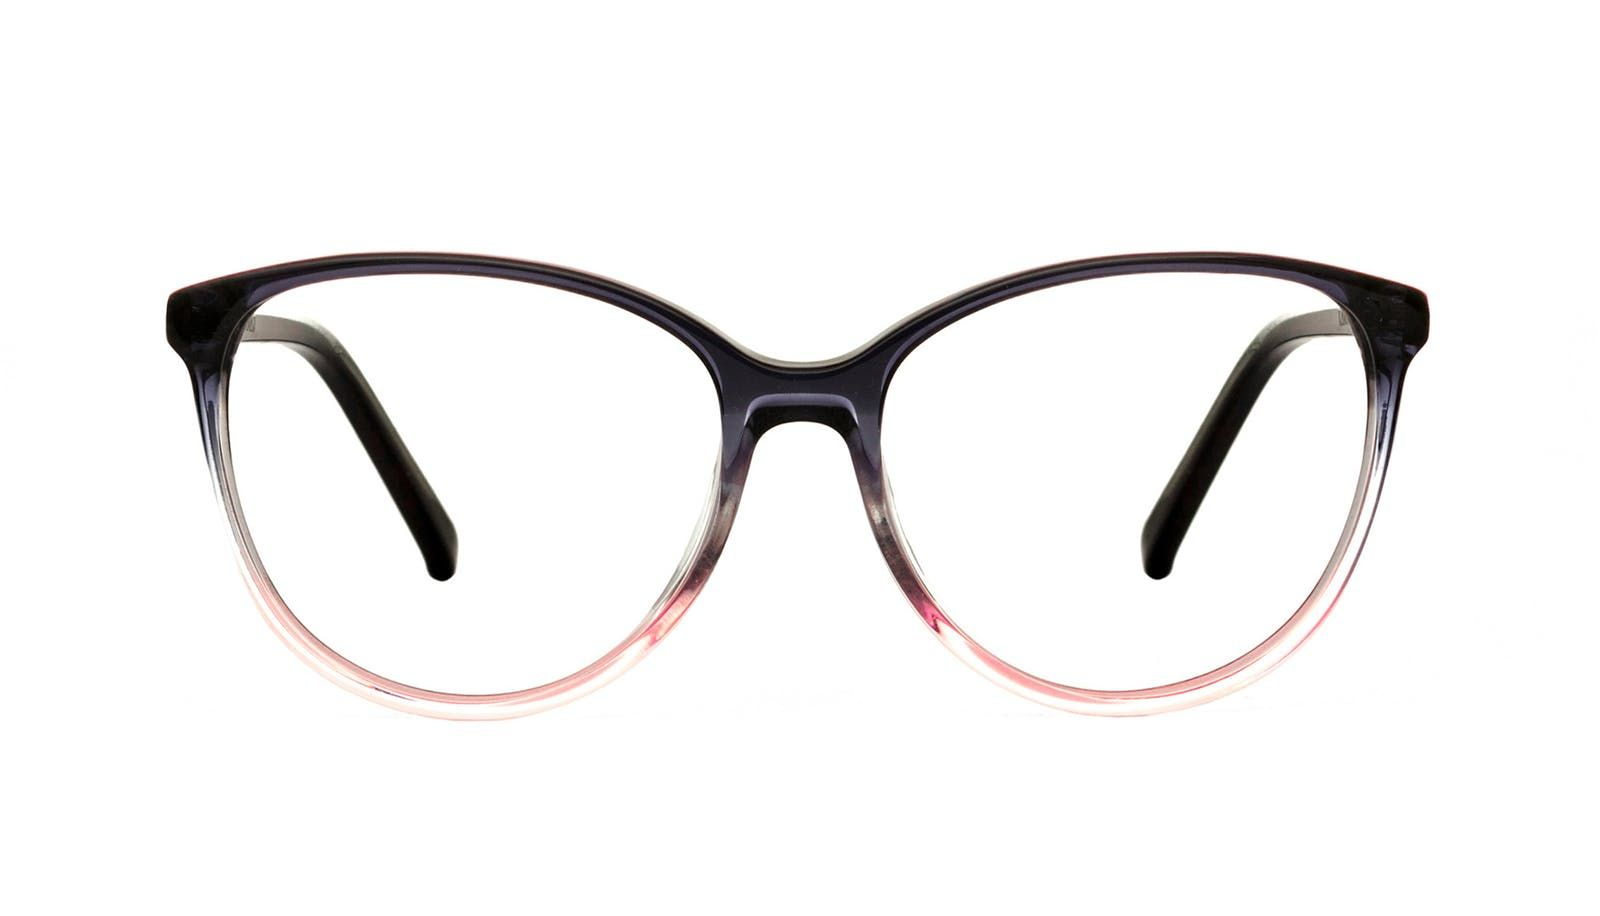 966c20f2ac4 Women s Eyeglasses - Imagine in Pink Dust